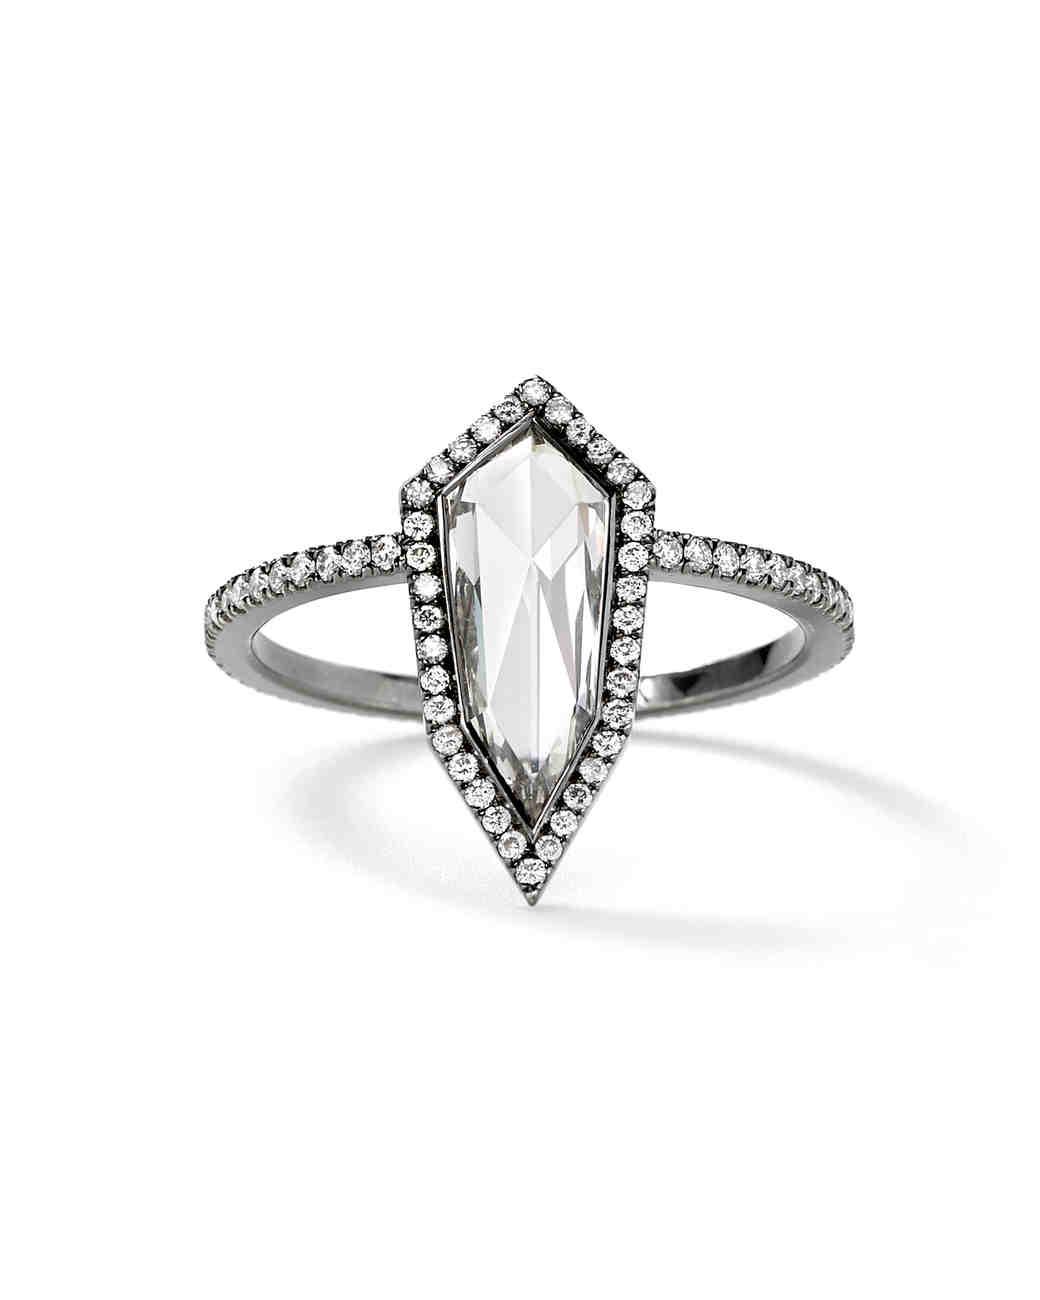 new-engagement-ring-designers-eva-fehren-warrior-0515.jpg